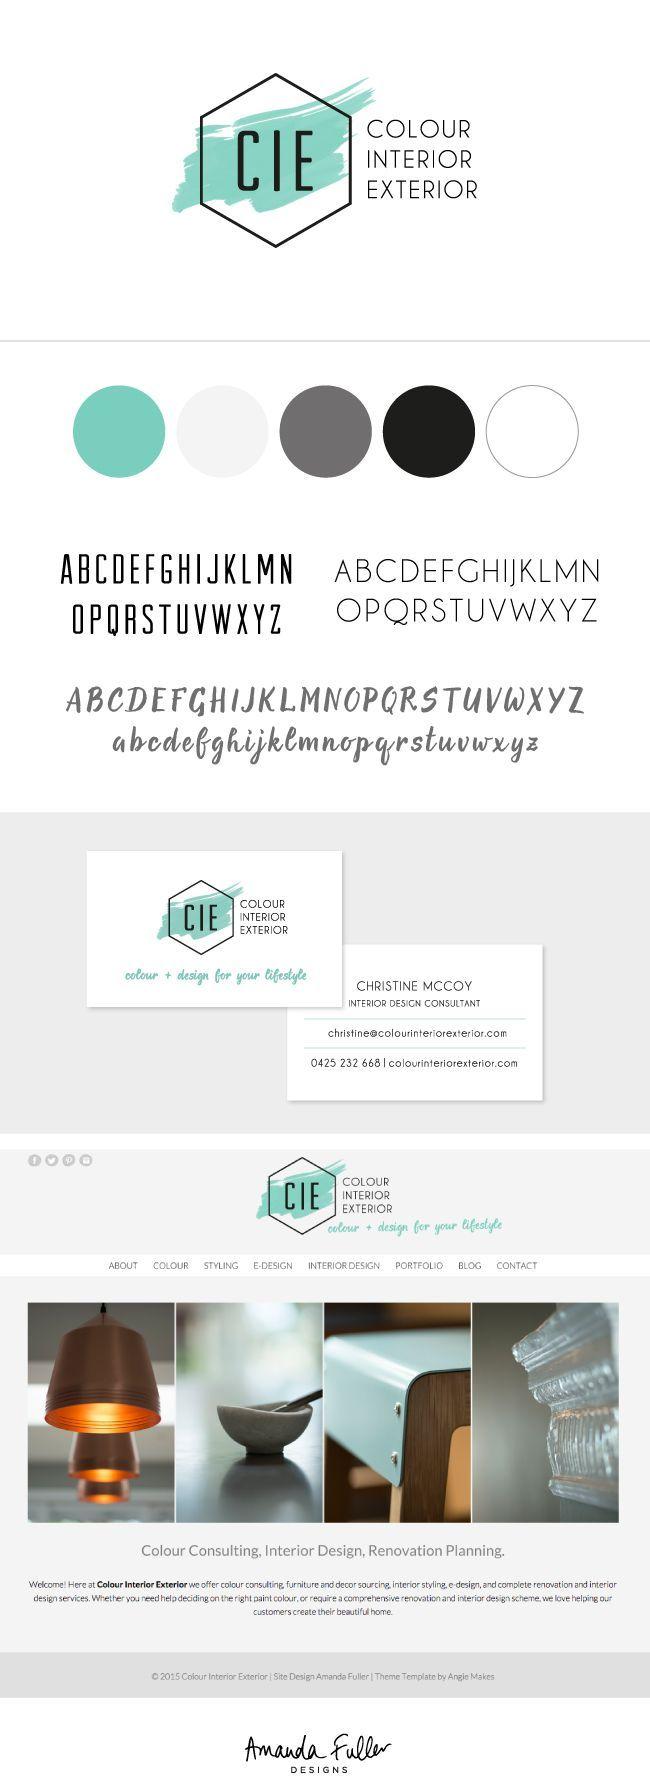 Colour Interior Exterior - Interior Design company logo, branding, business card and website design by Amanda Fuller Designs